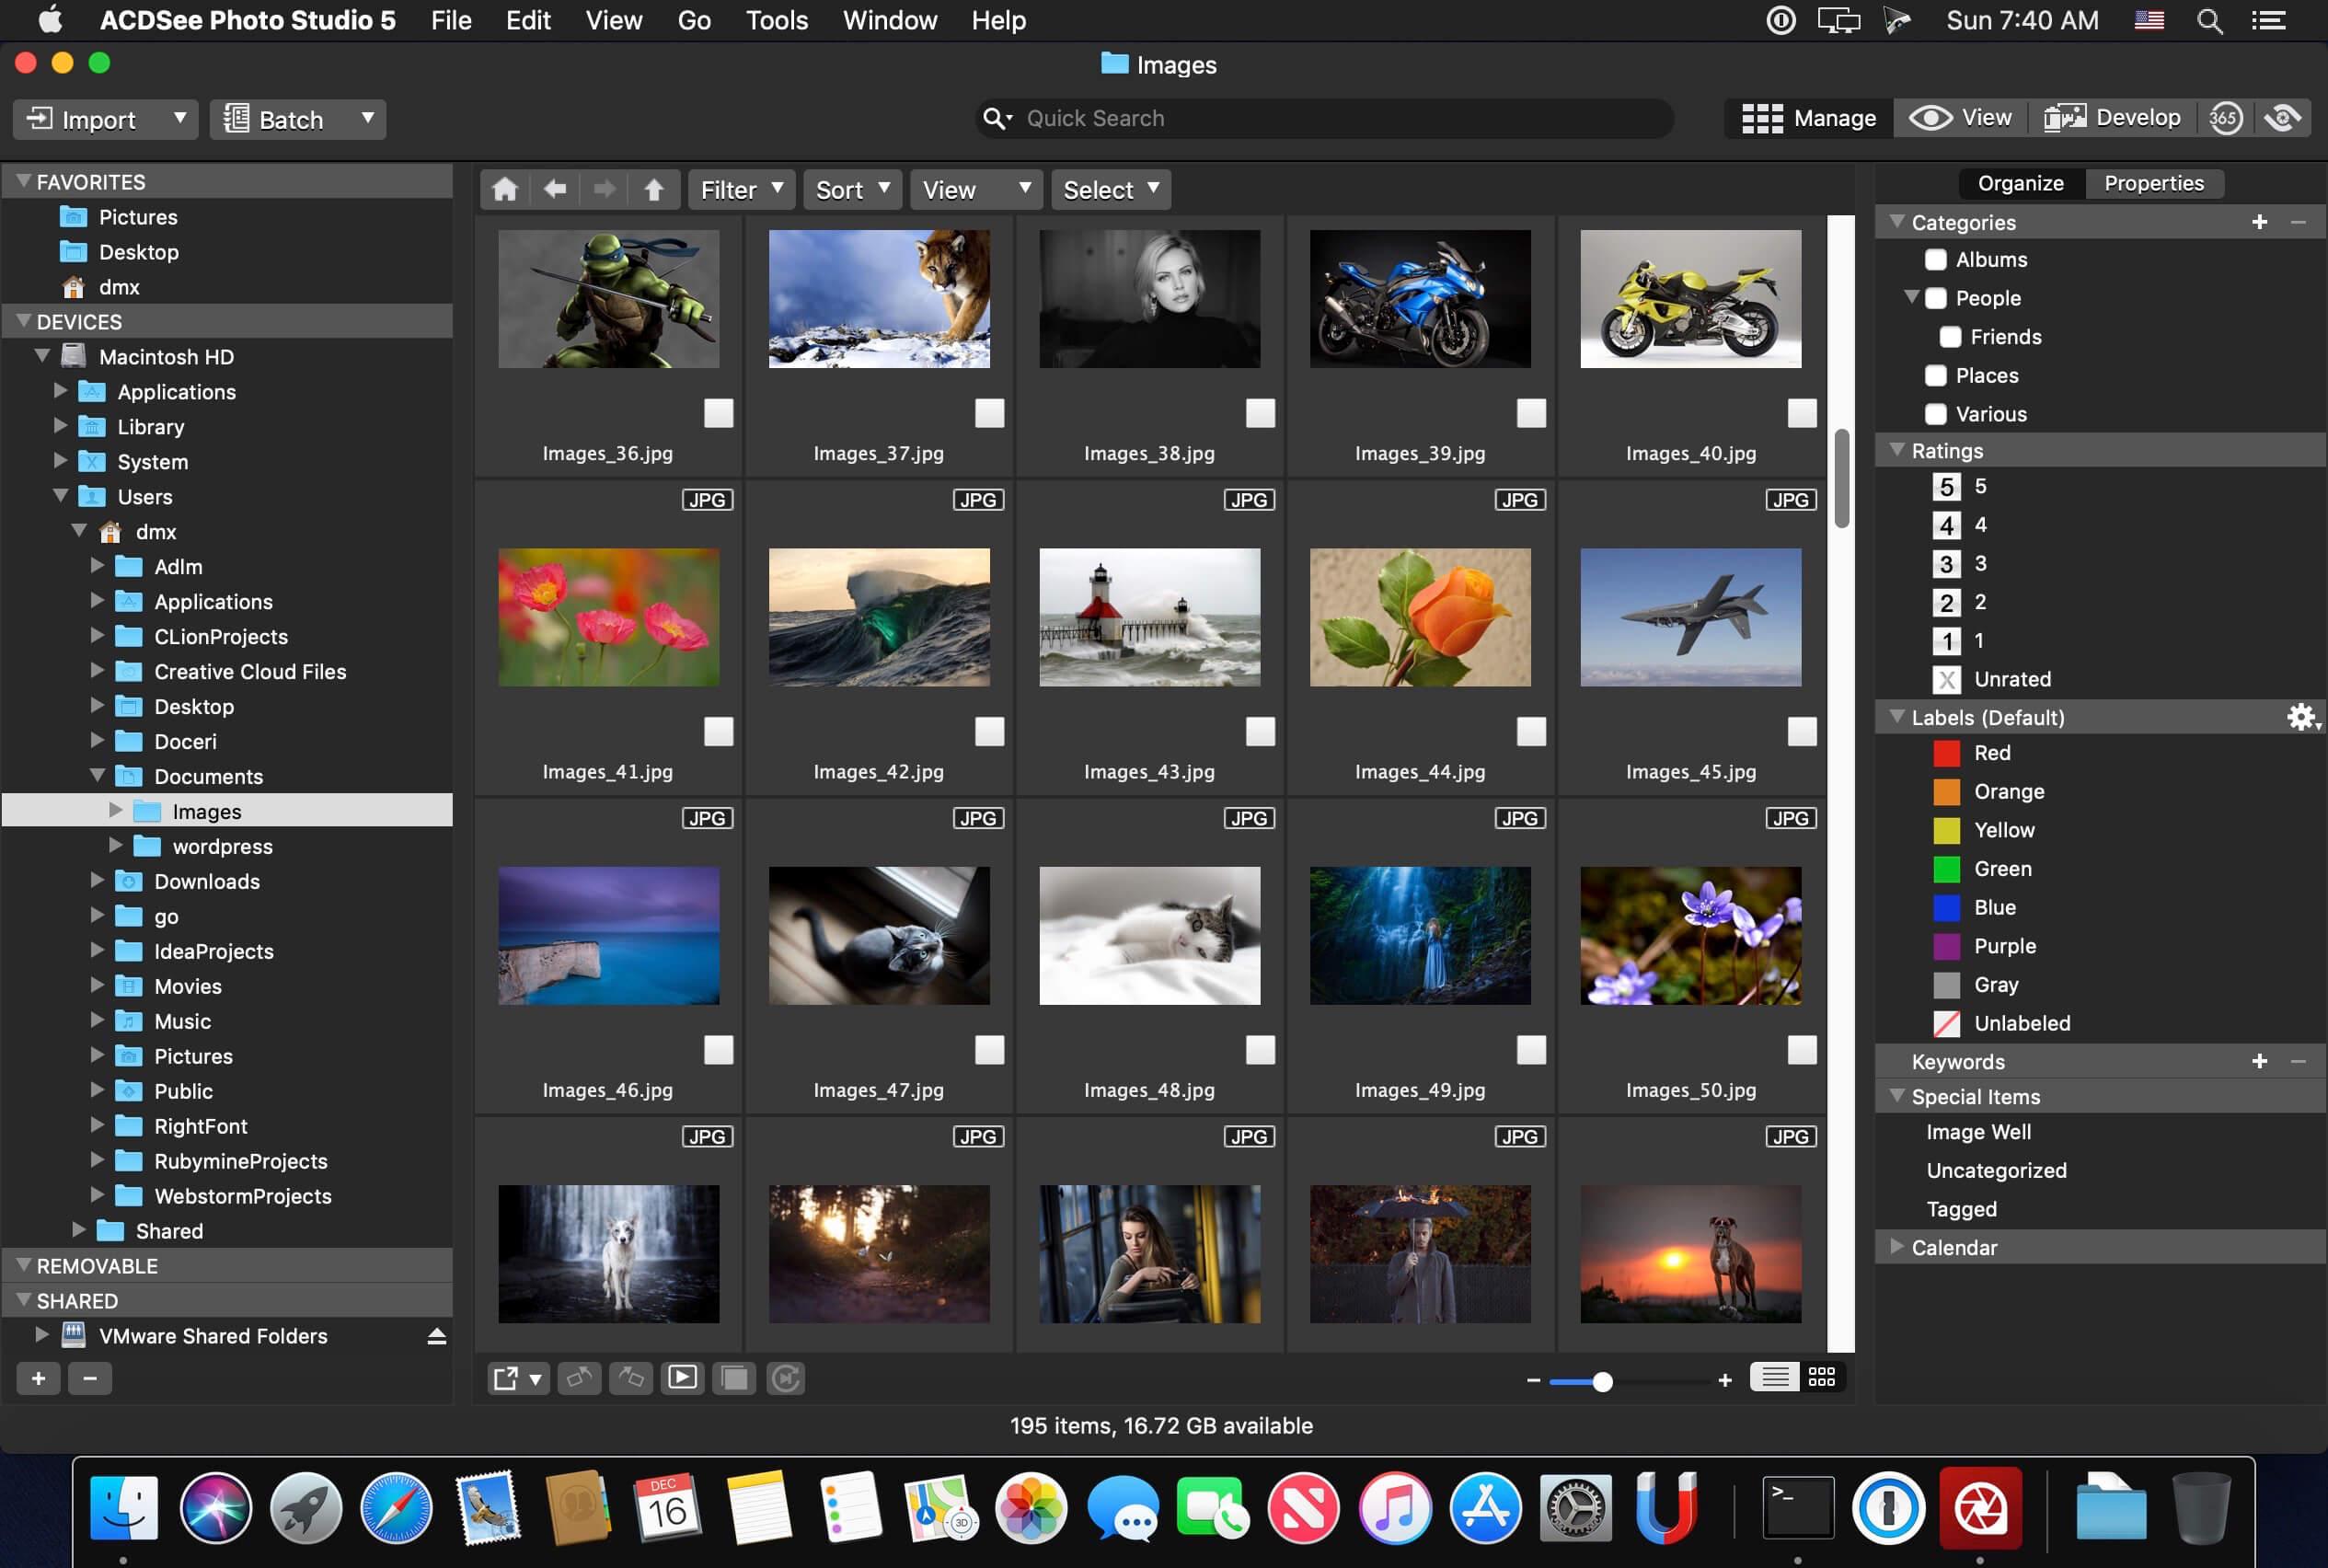 ACDSee Photo Studio 5.1.1130 - 老牌好用的看图工具